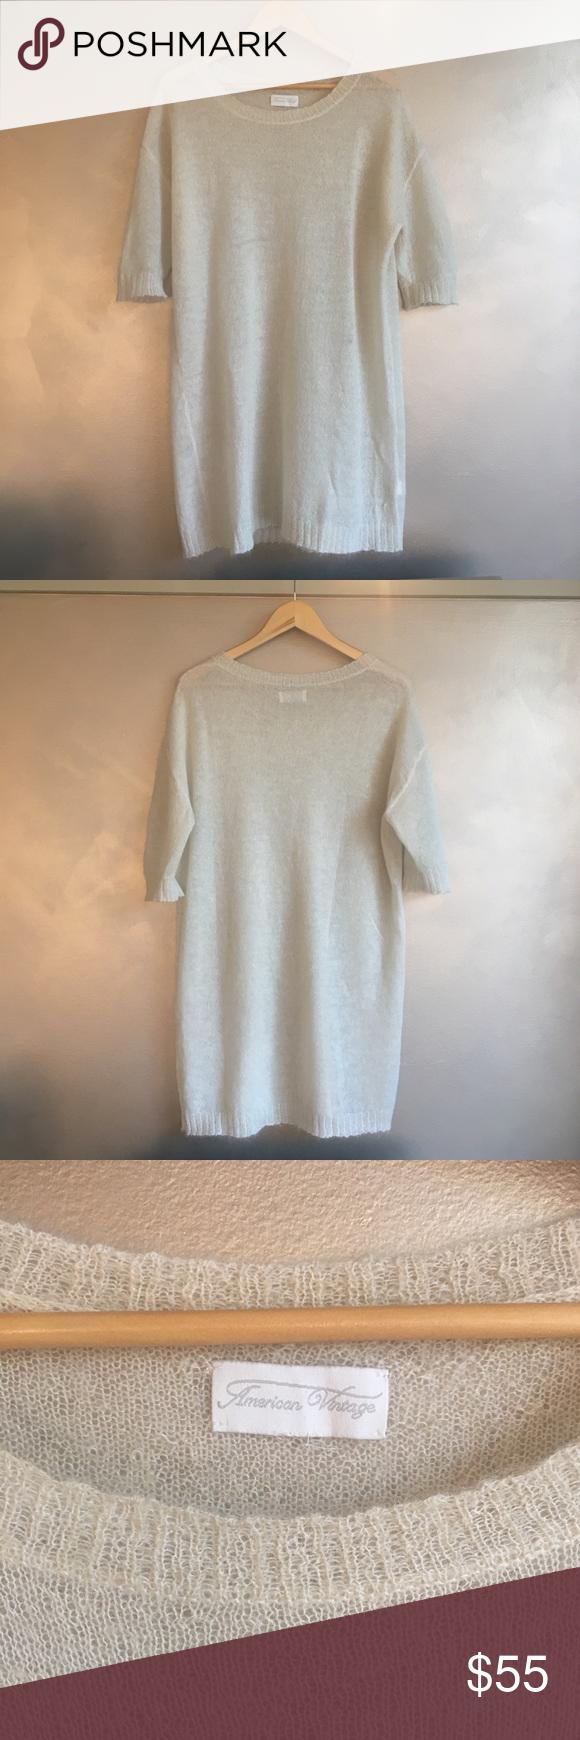 American Vintage Sweater Dress Jumper Merino Wool Vintage Sweaters American Vintage Sweater Dress